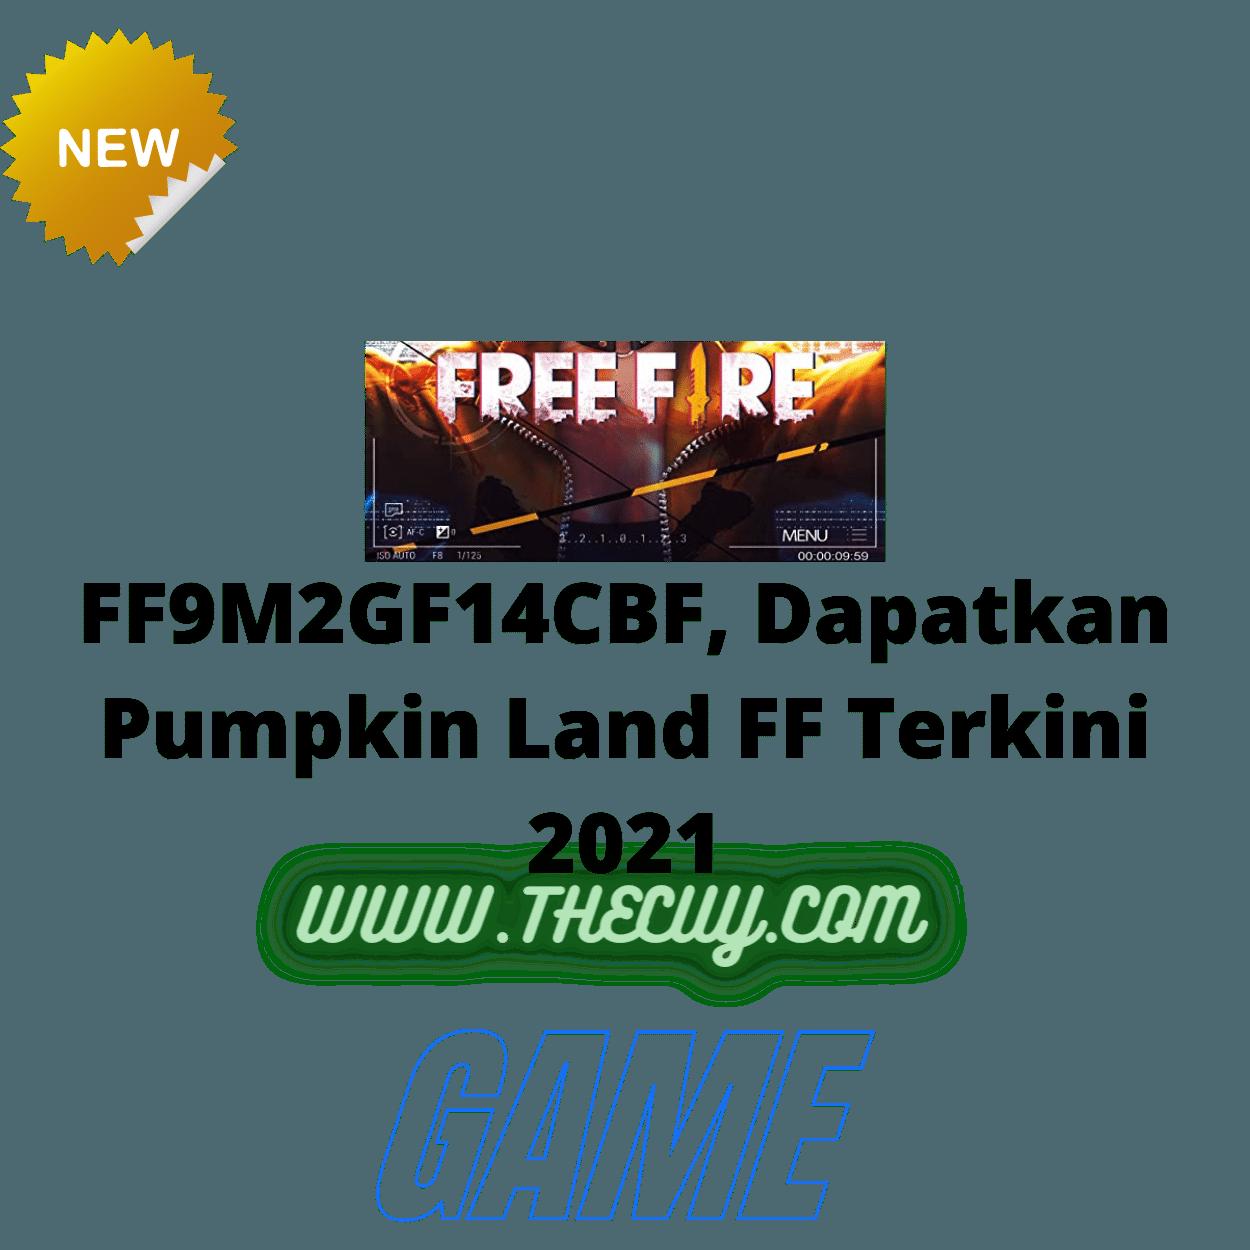 FF9M2GF14CBF, Dapatkan Pumpkin Land FF Terkini 2021